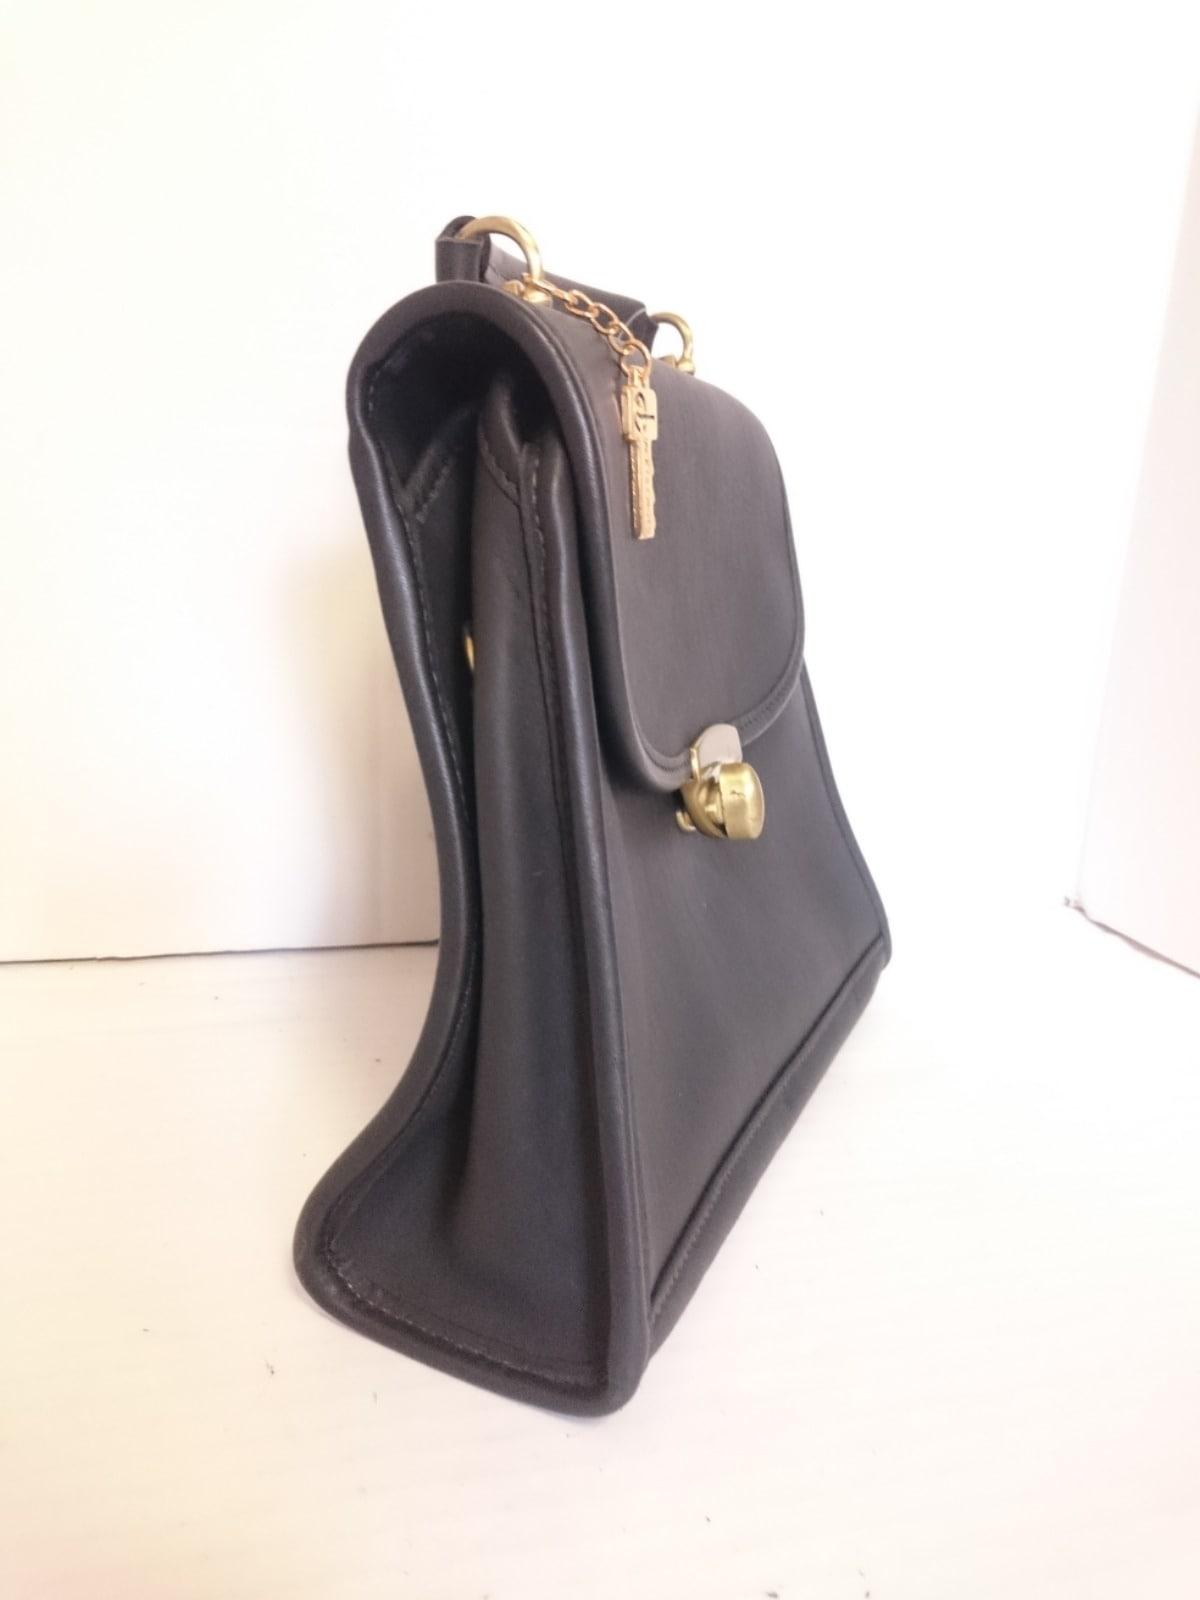 JACK GEORGES(ジャックジョージ)のハンドバッグ